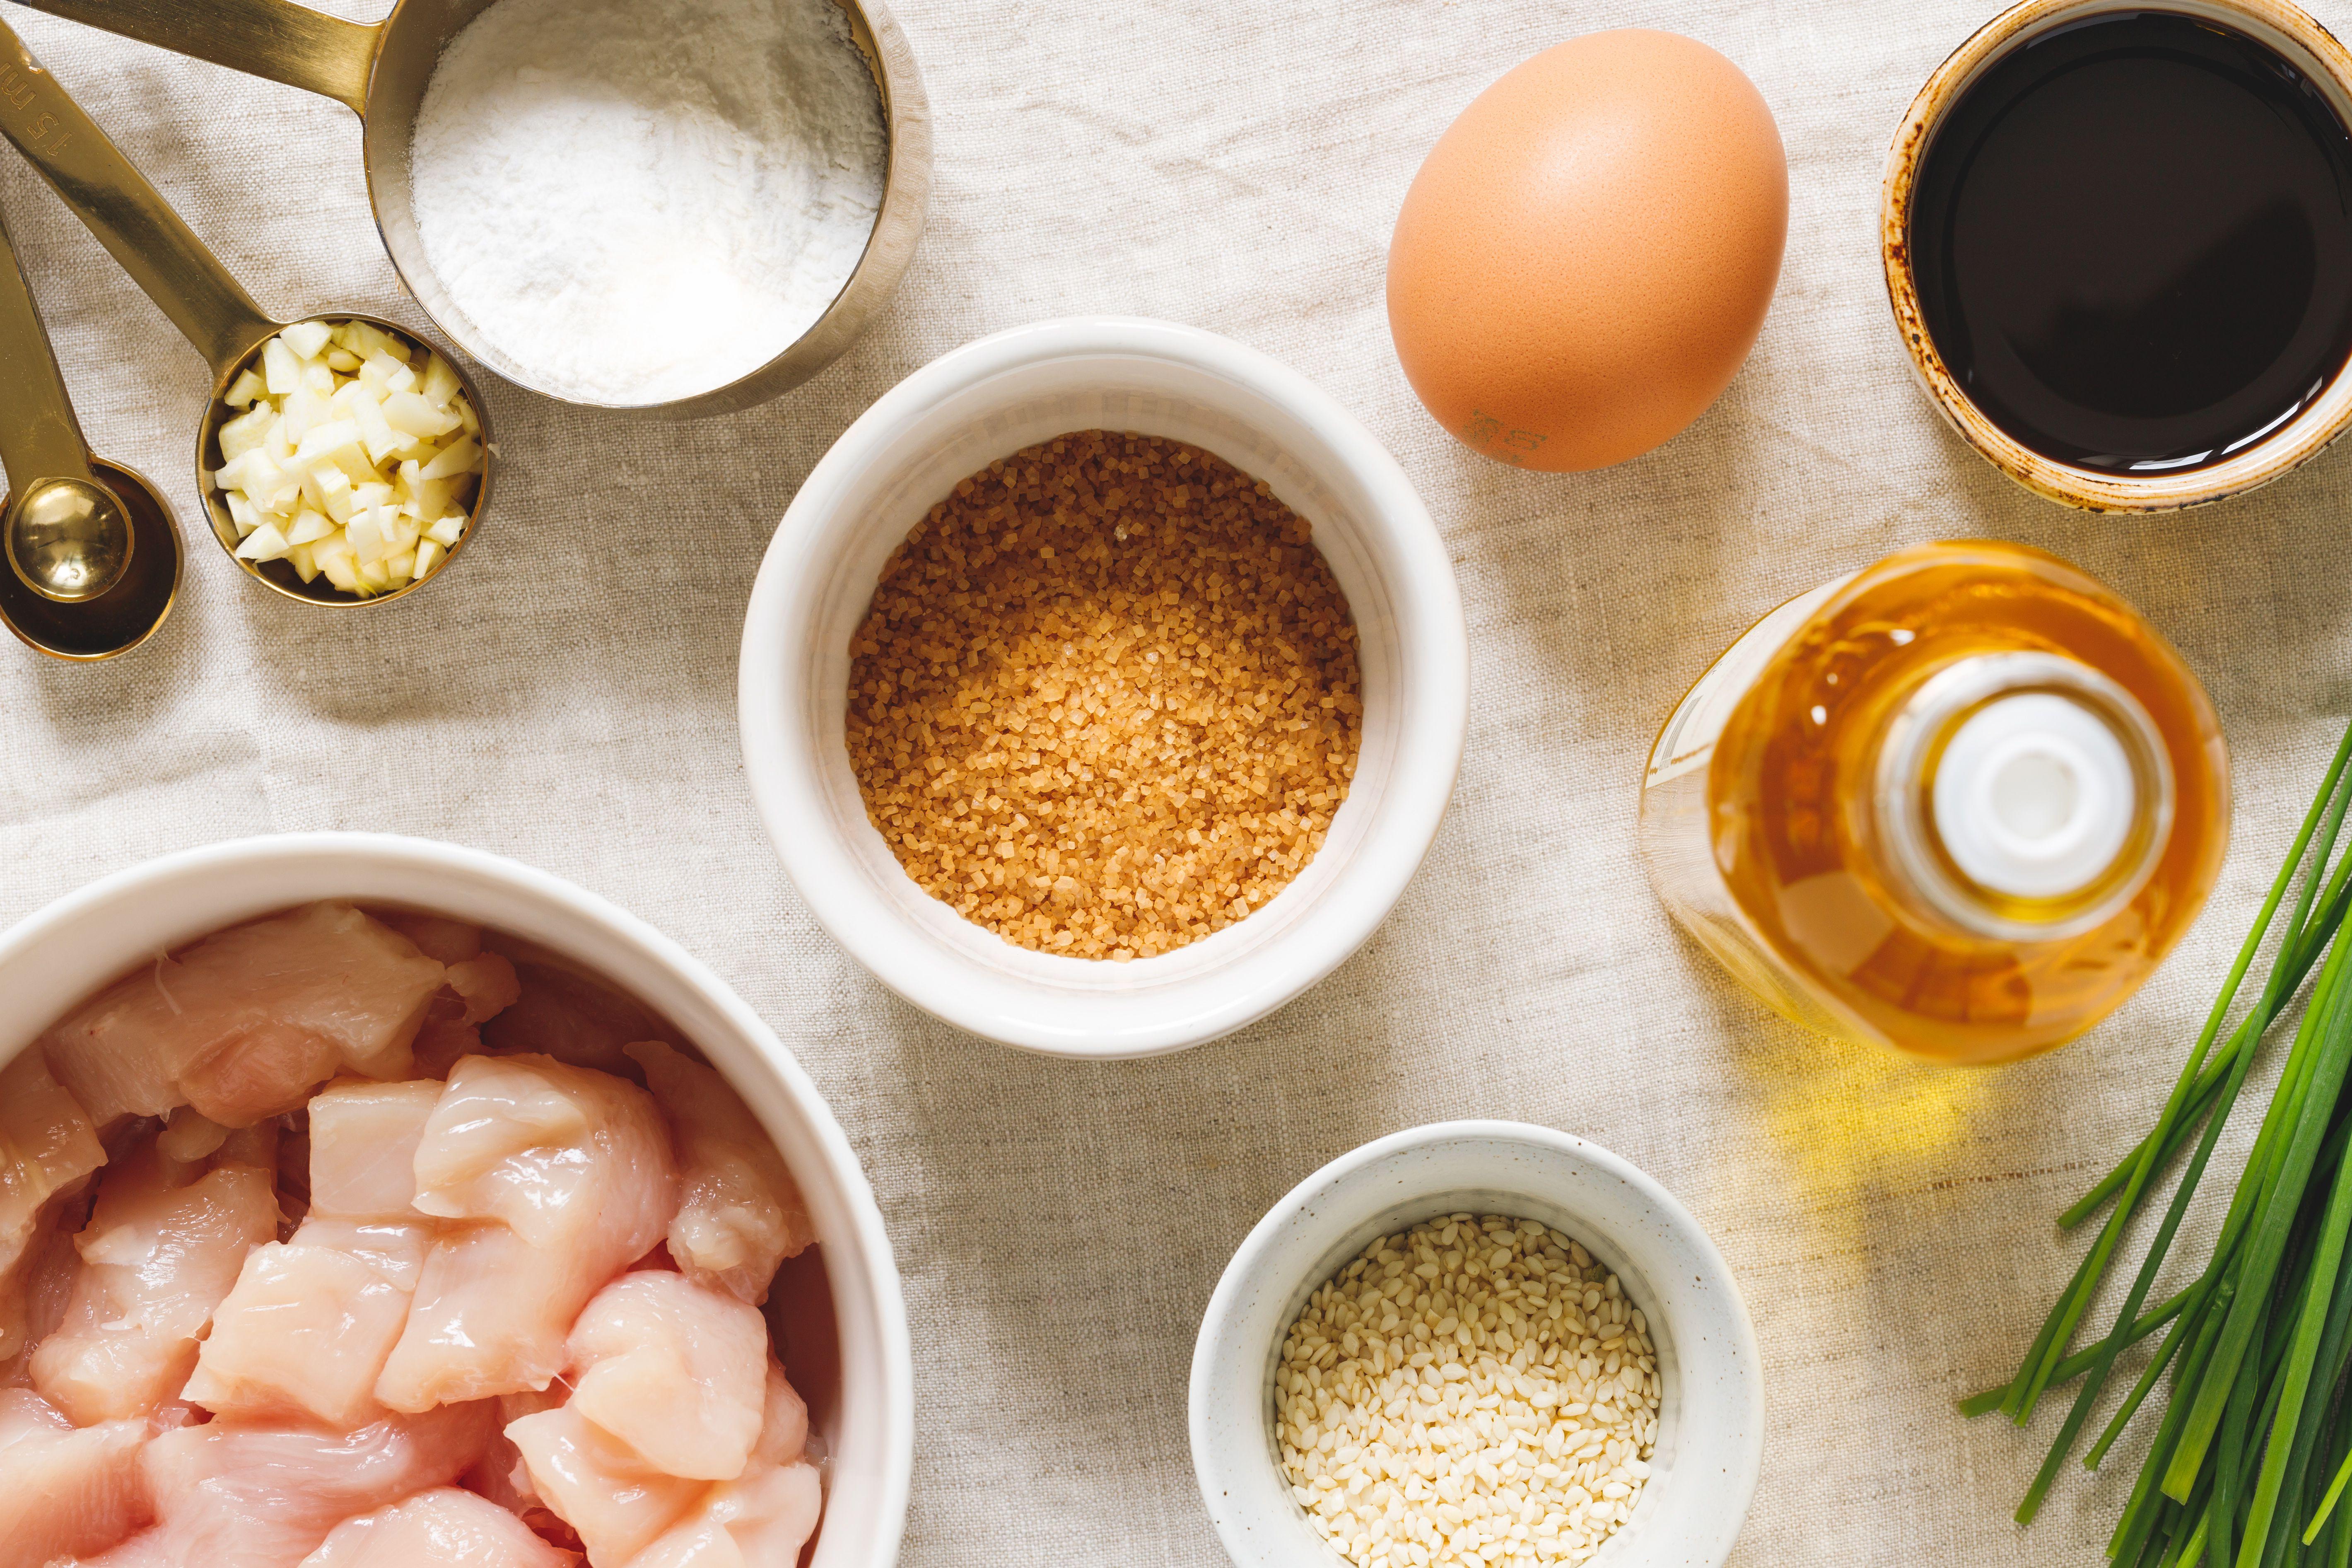 Ingredients for sesame chicken